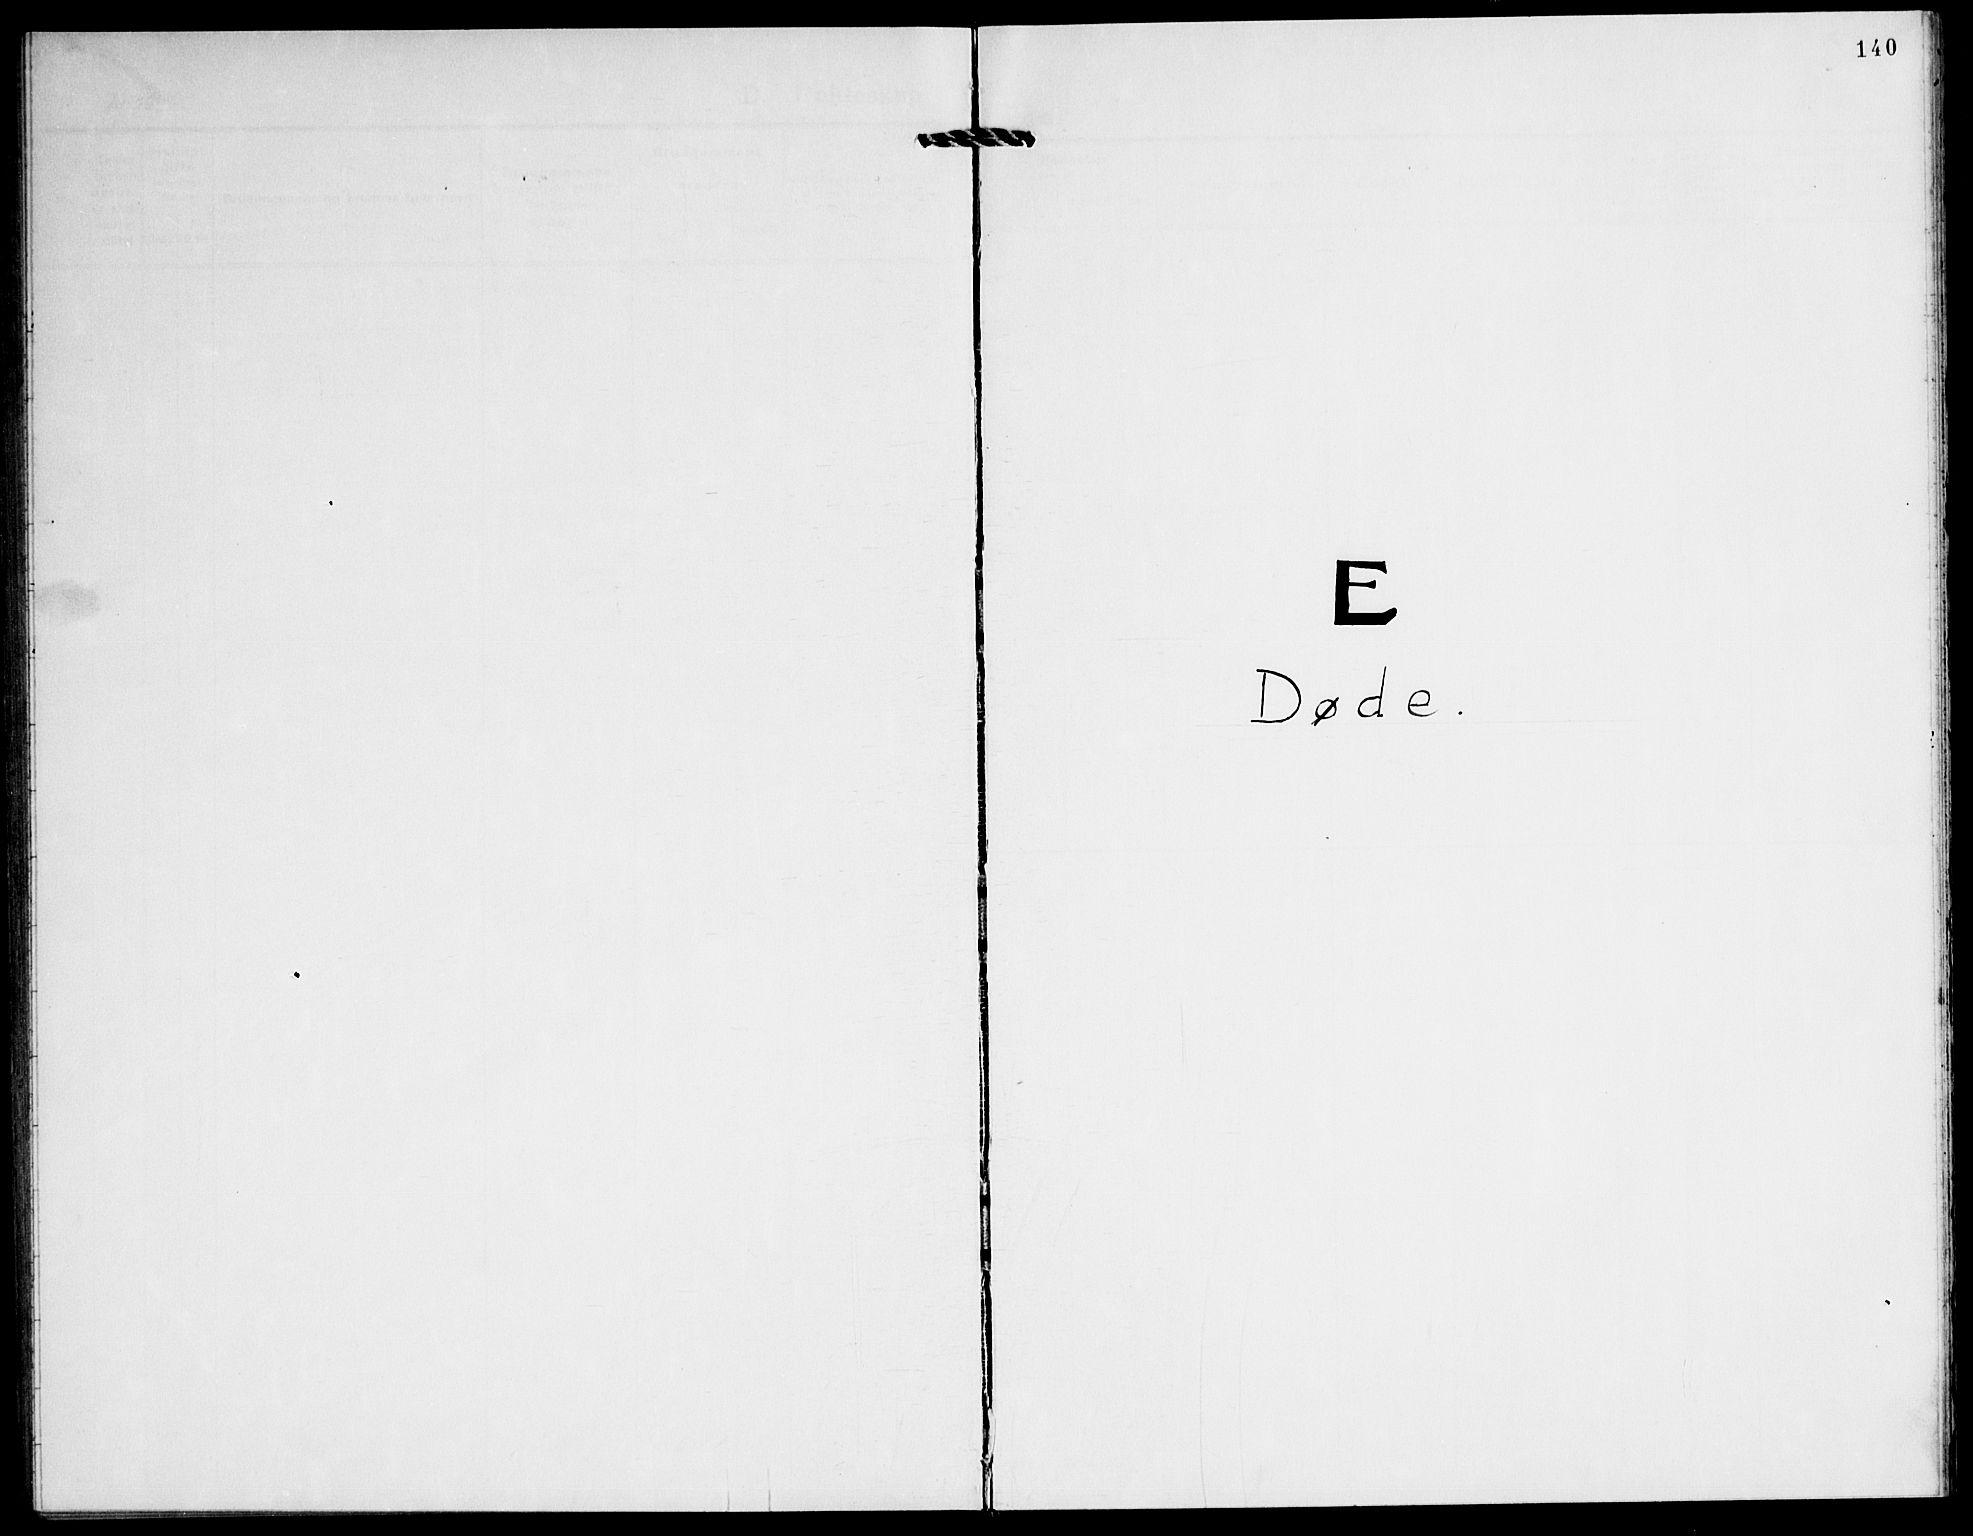 SATØ, Tranøy sokneprestkontor, I/Ia/Iab/L0016klokker: Klokkerbok nr. 16, 1930-1945, s. 140